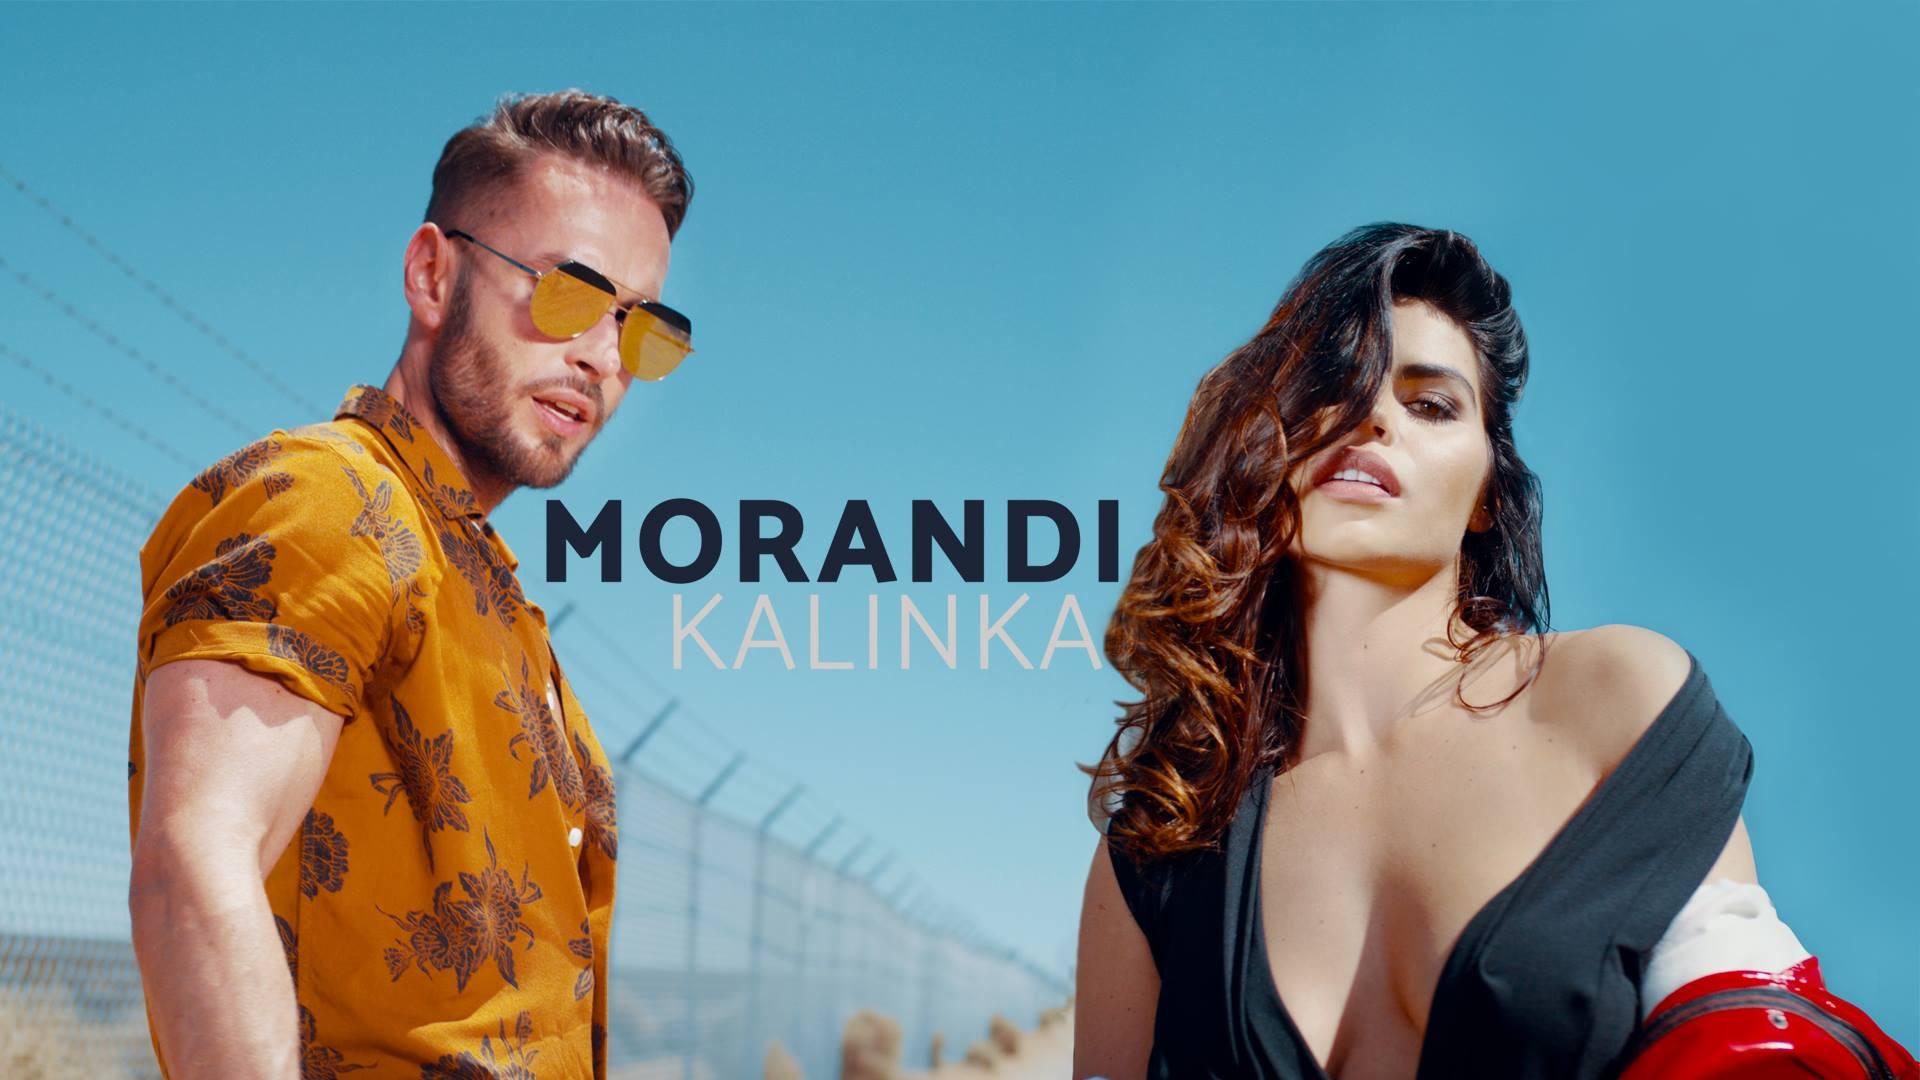 Morandi - Kalinka